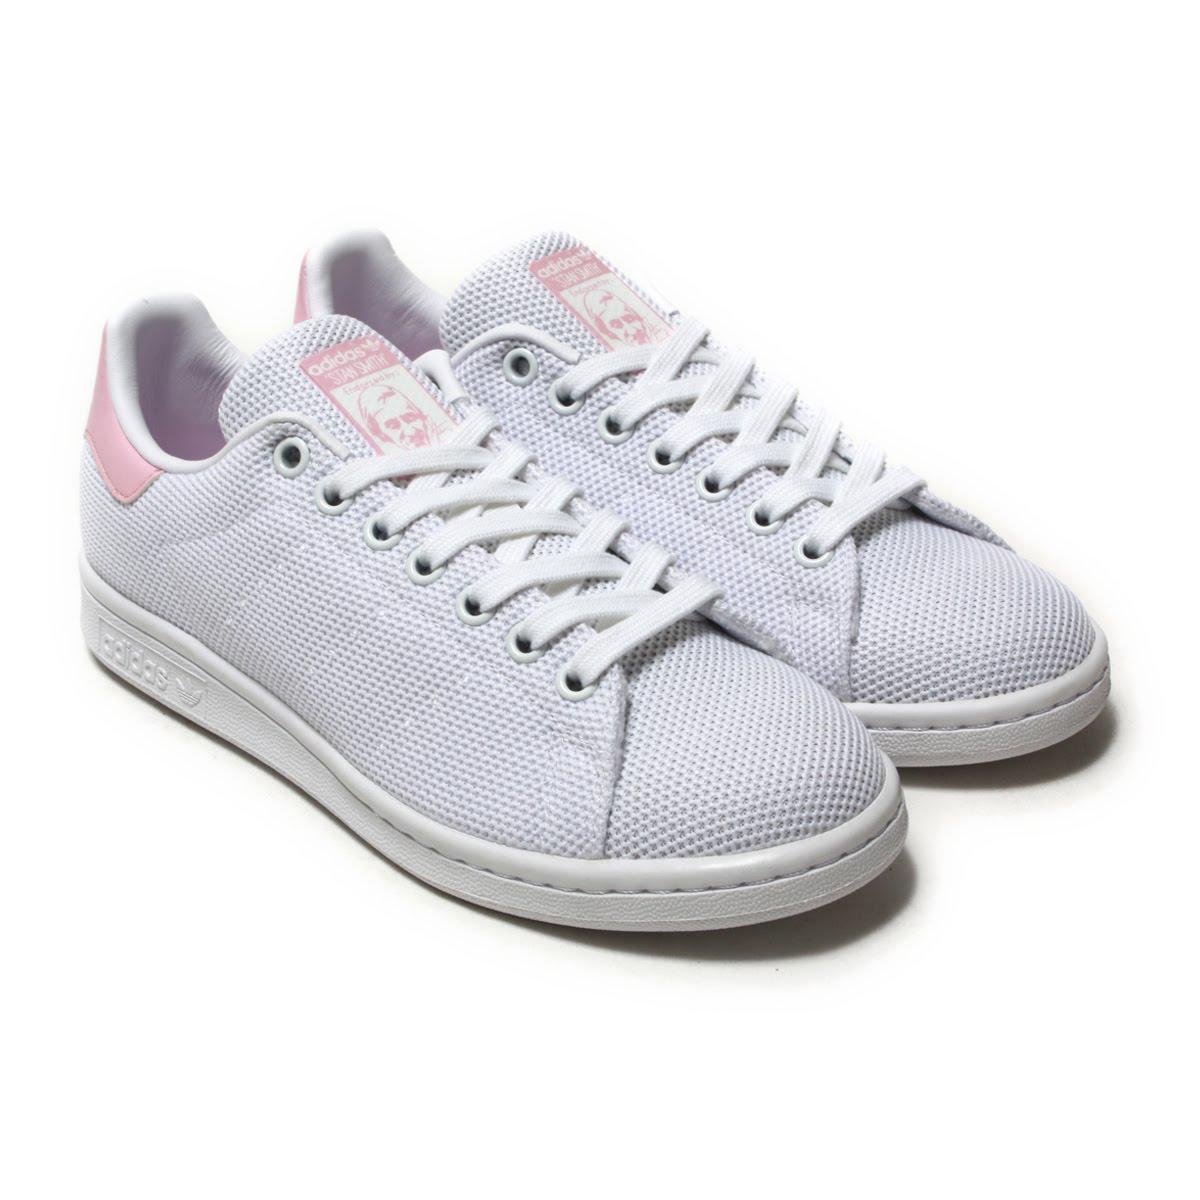 adidas Originals STAN SMITH W(アディダス オリジナルス スタンスミス W)Running White/Running White/Wonder Pink【メンズ レディース スニーカー】18SS-I